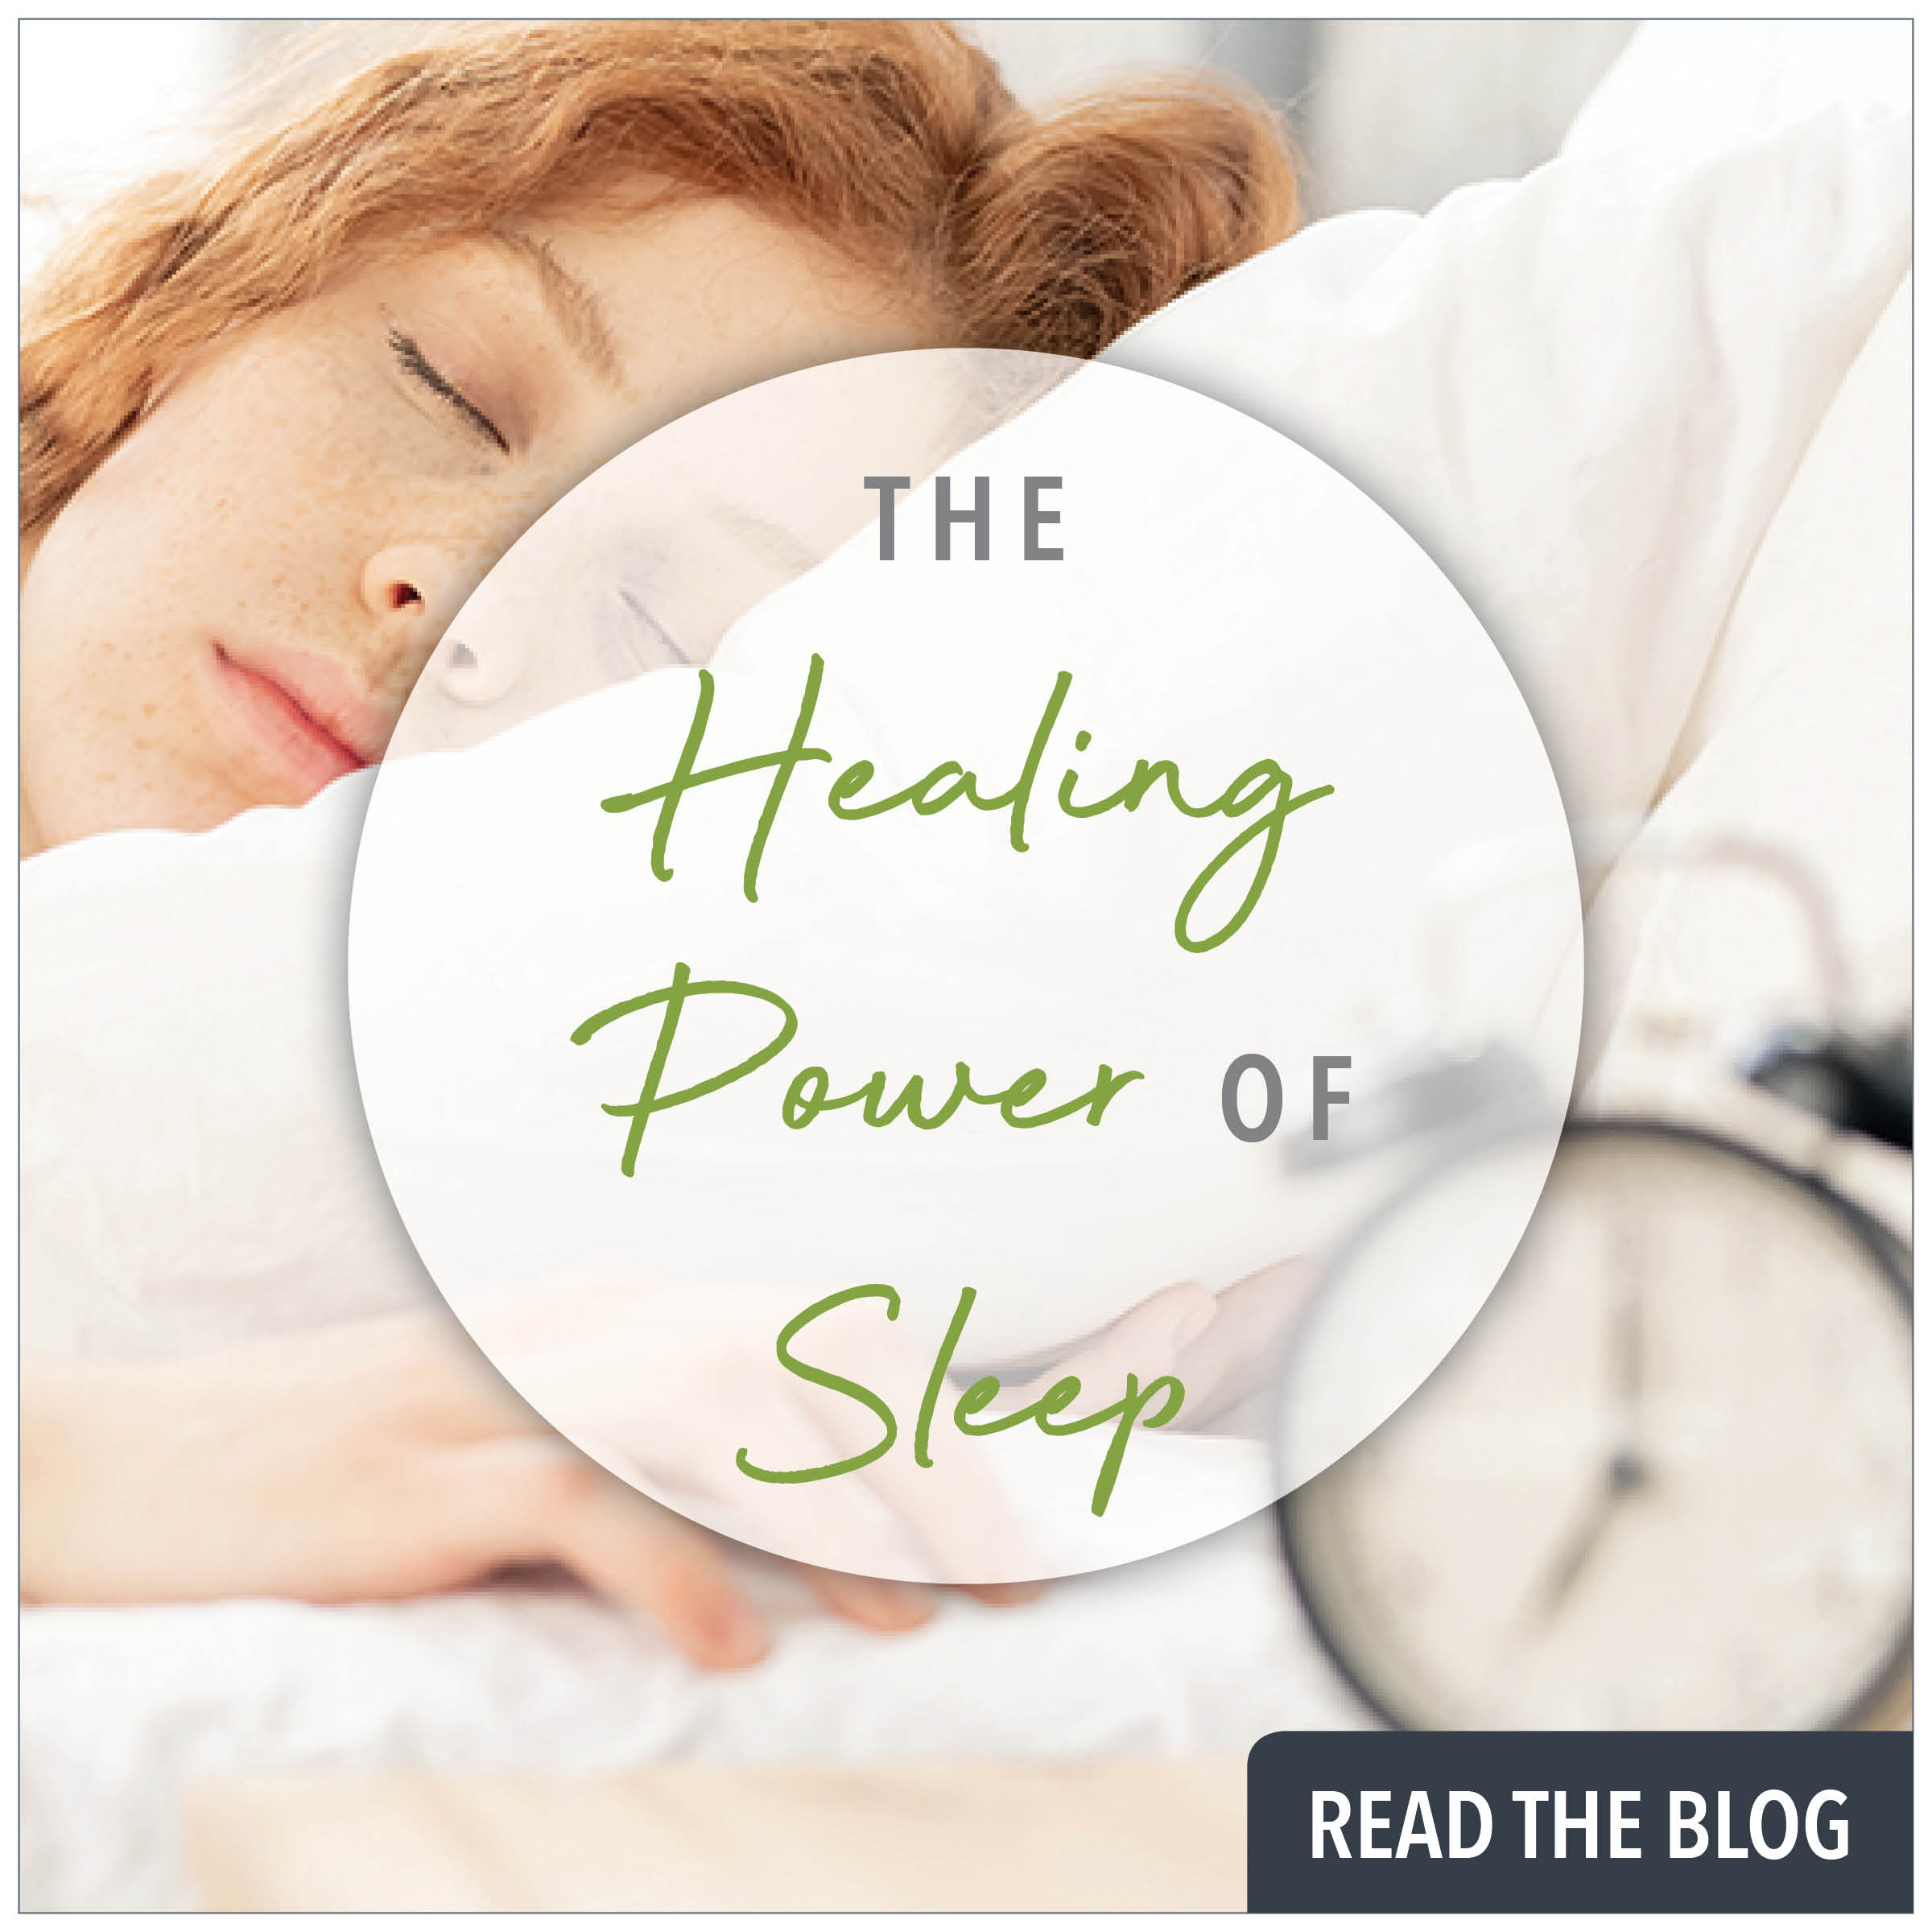 the healing power of sleep by prodermal